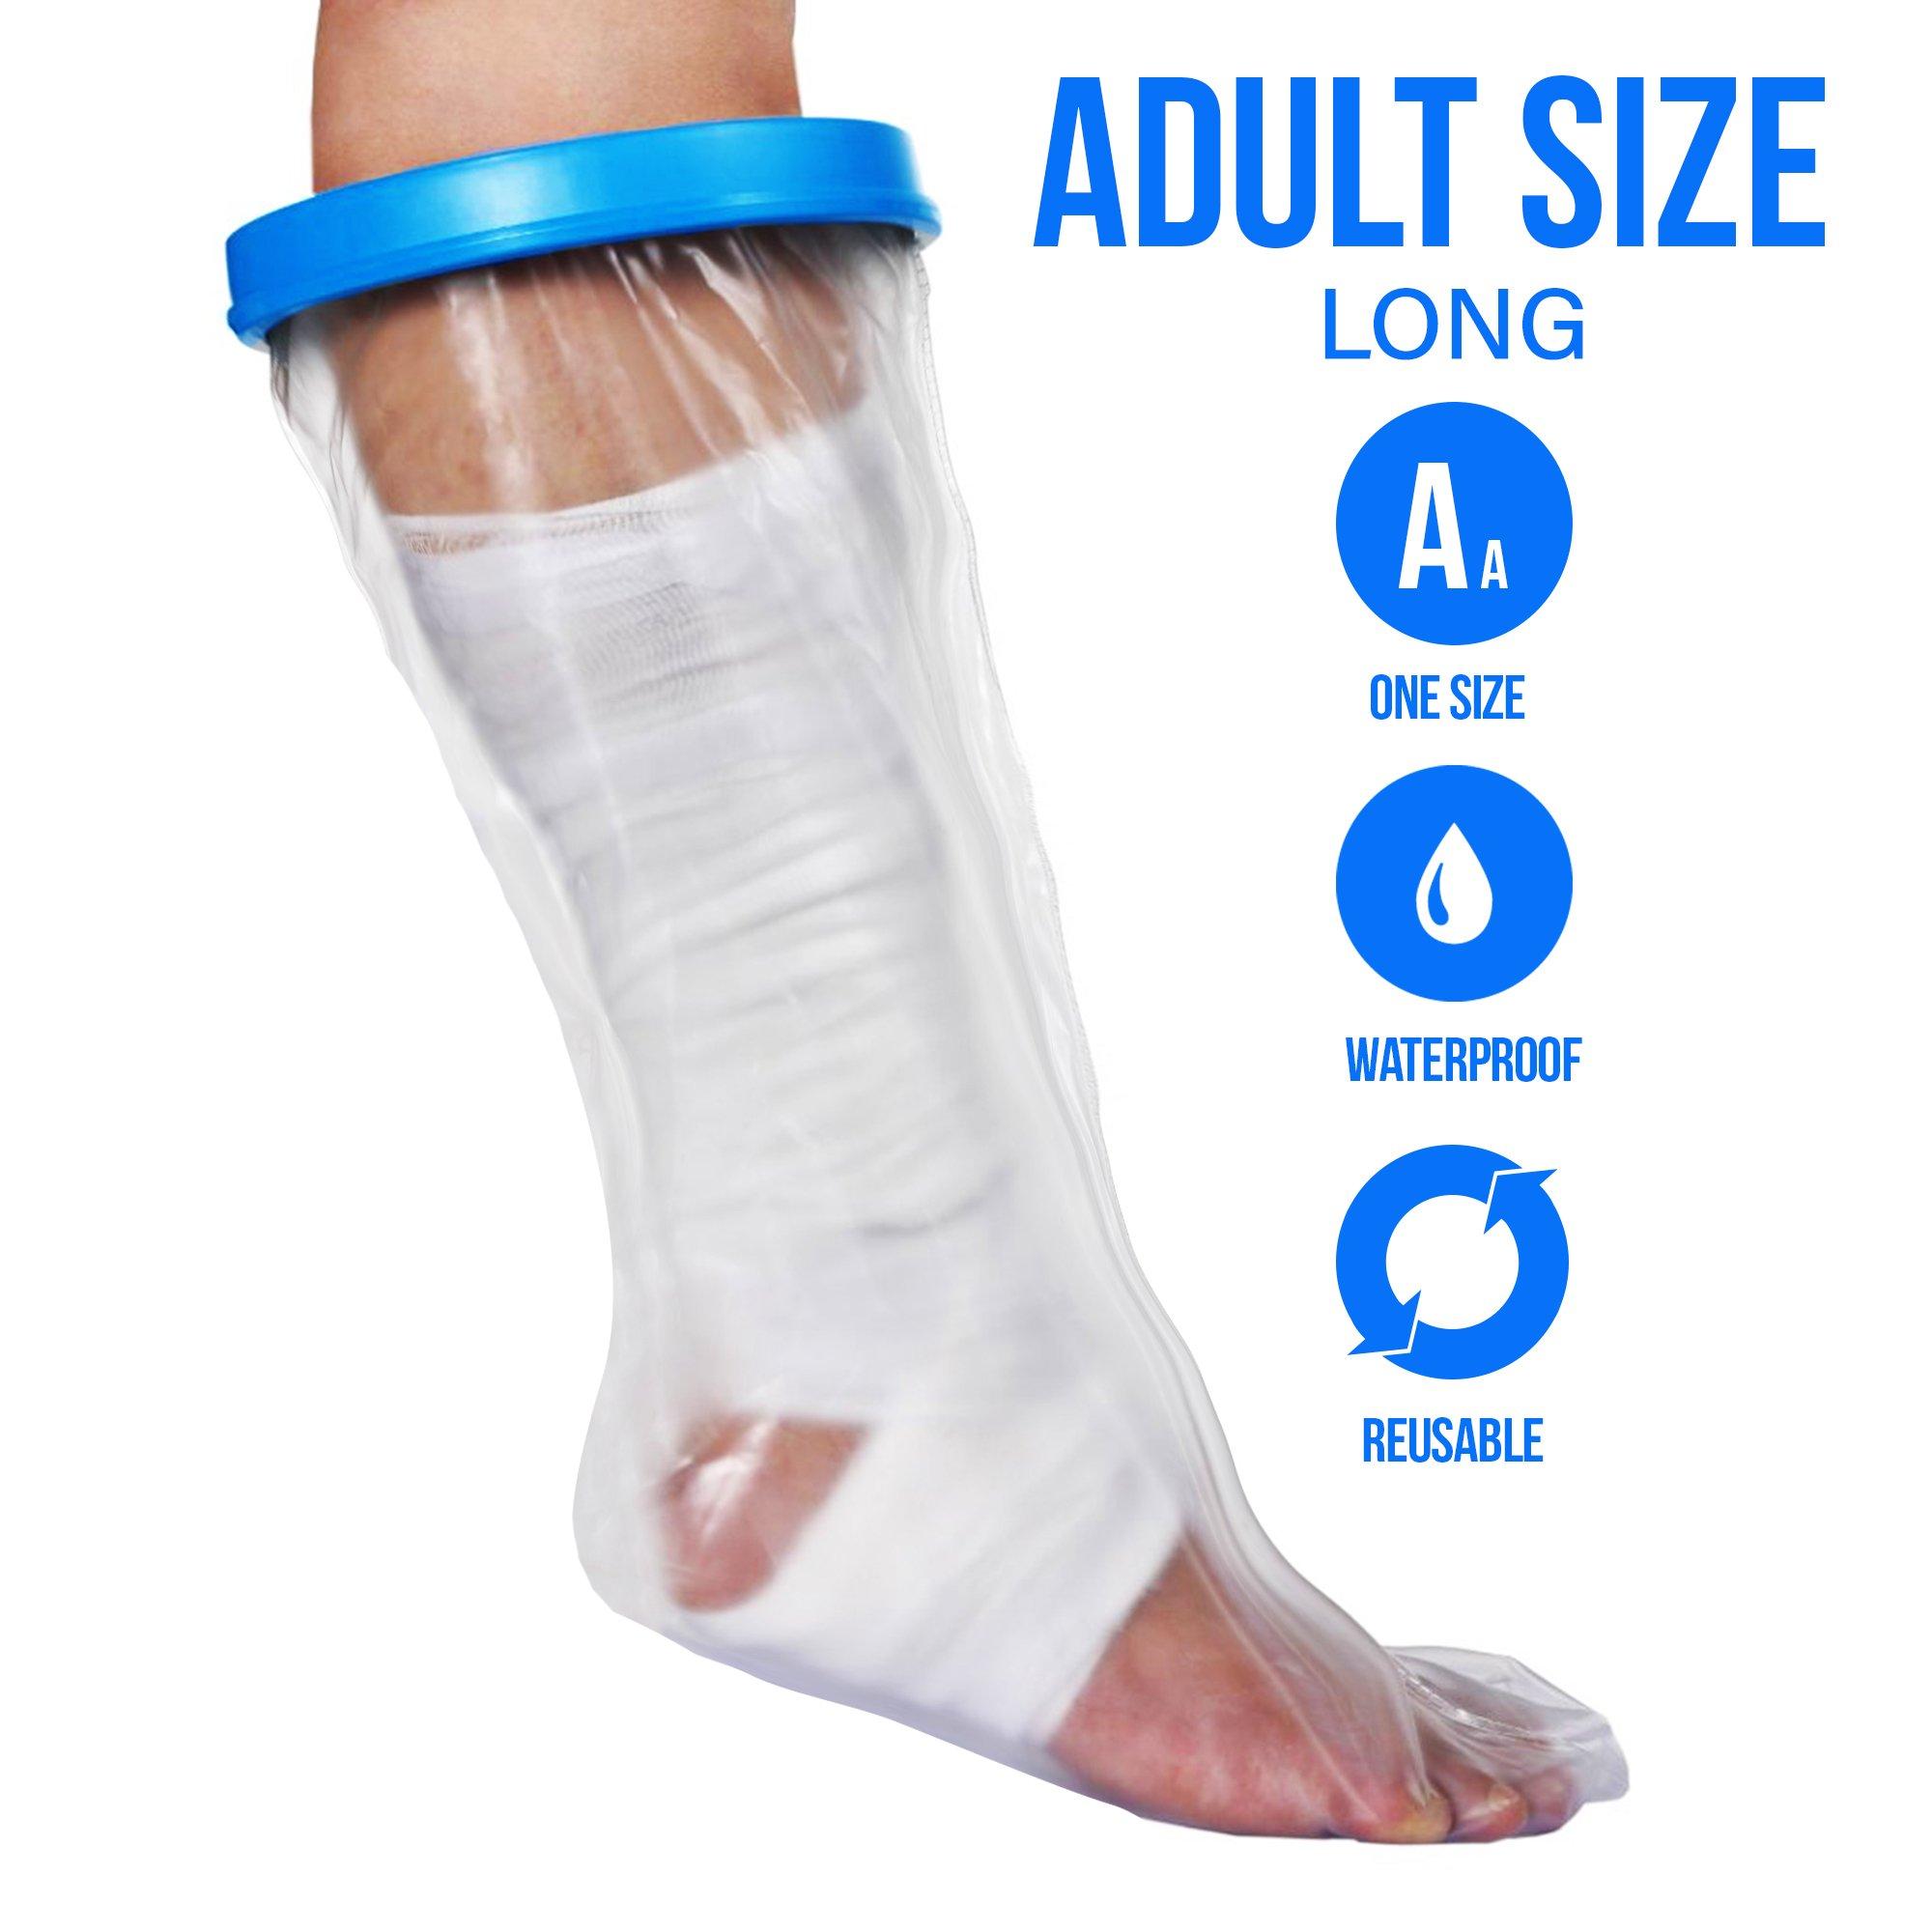 Waterproof Cast Cover for Shower & Bath - Adult Leg. (Large)